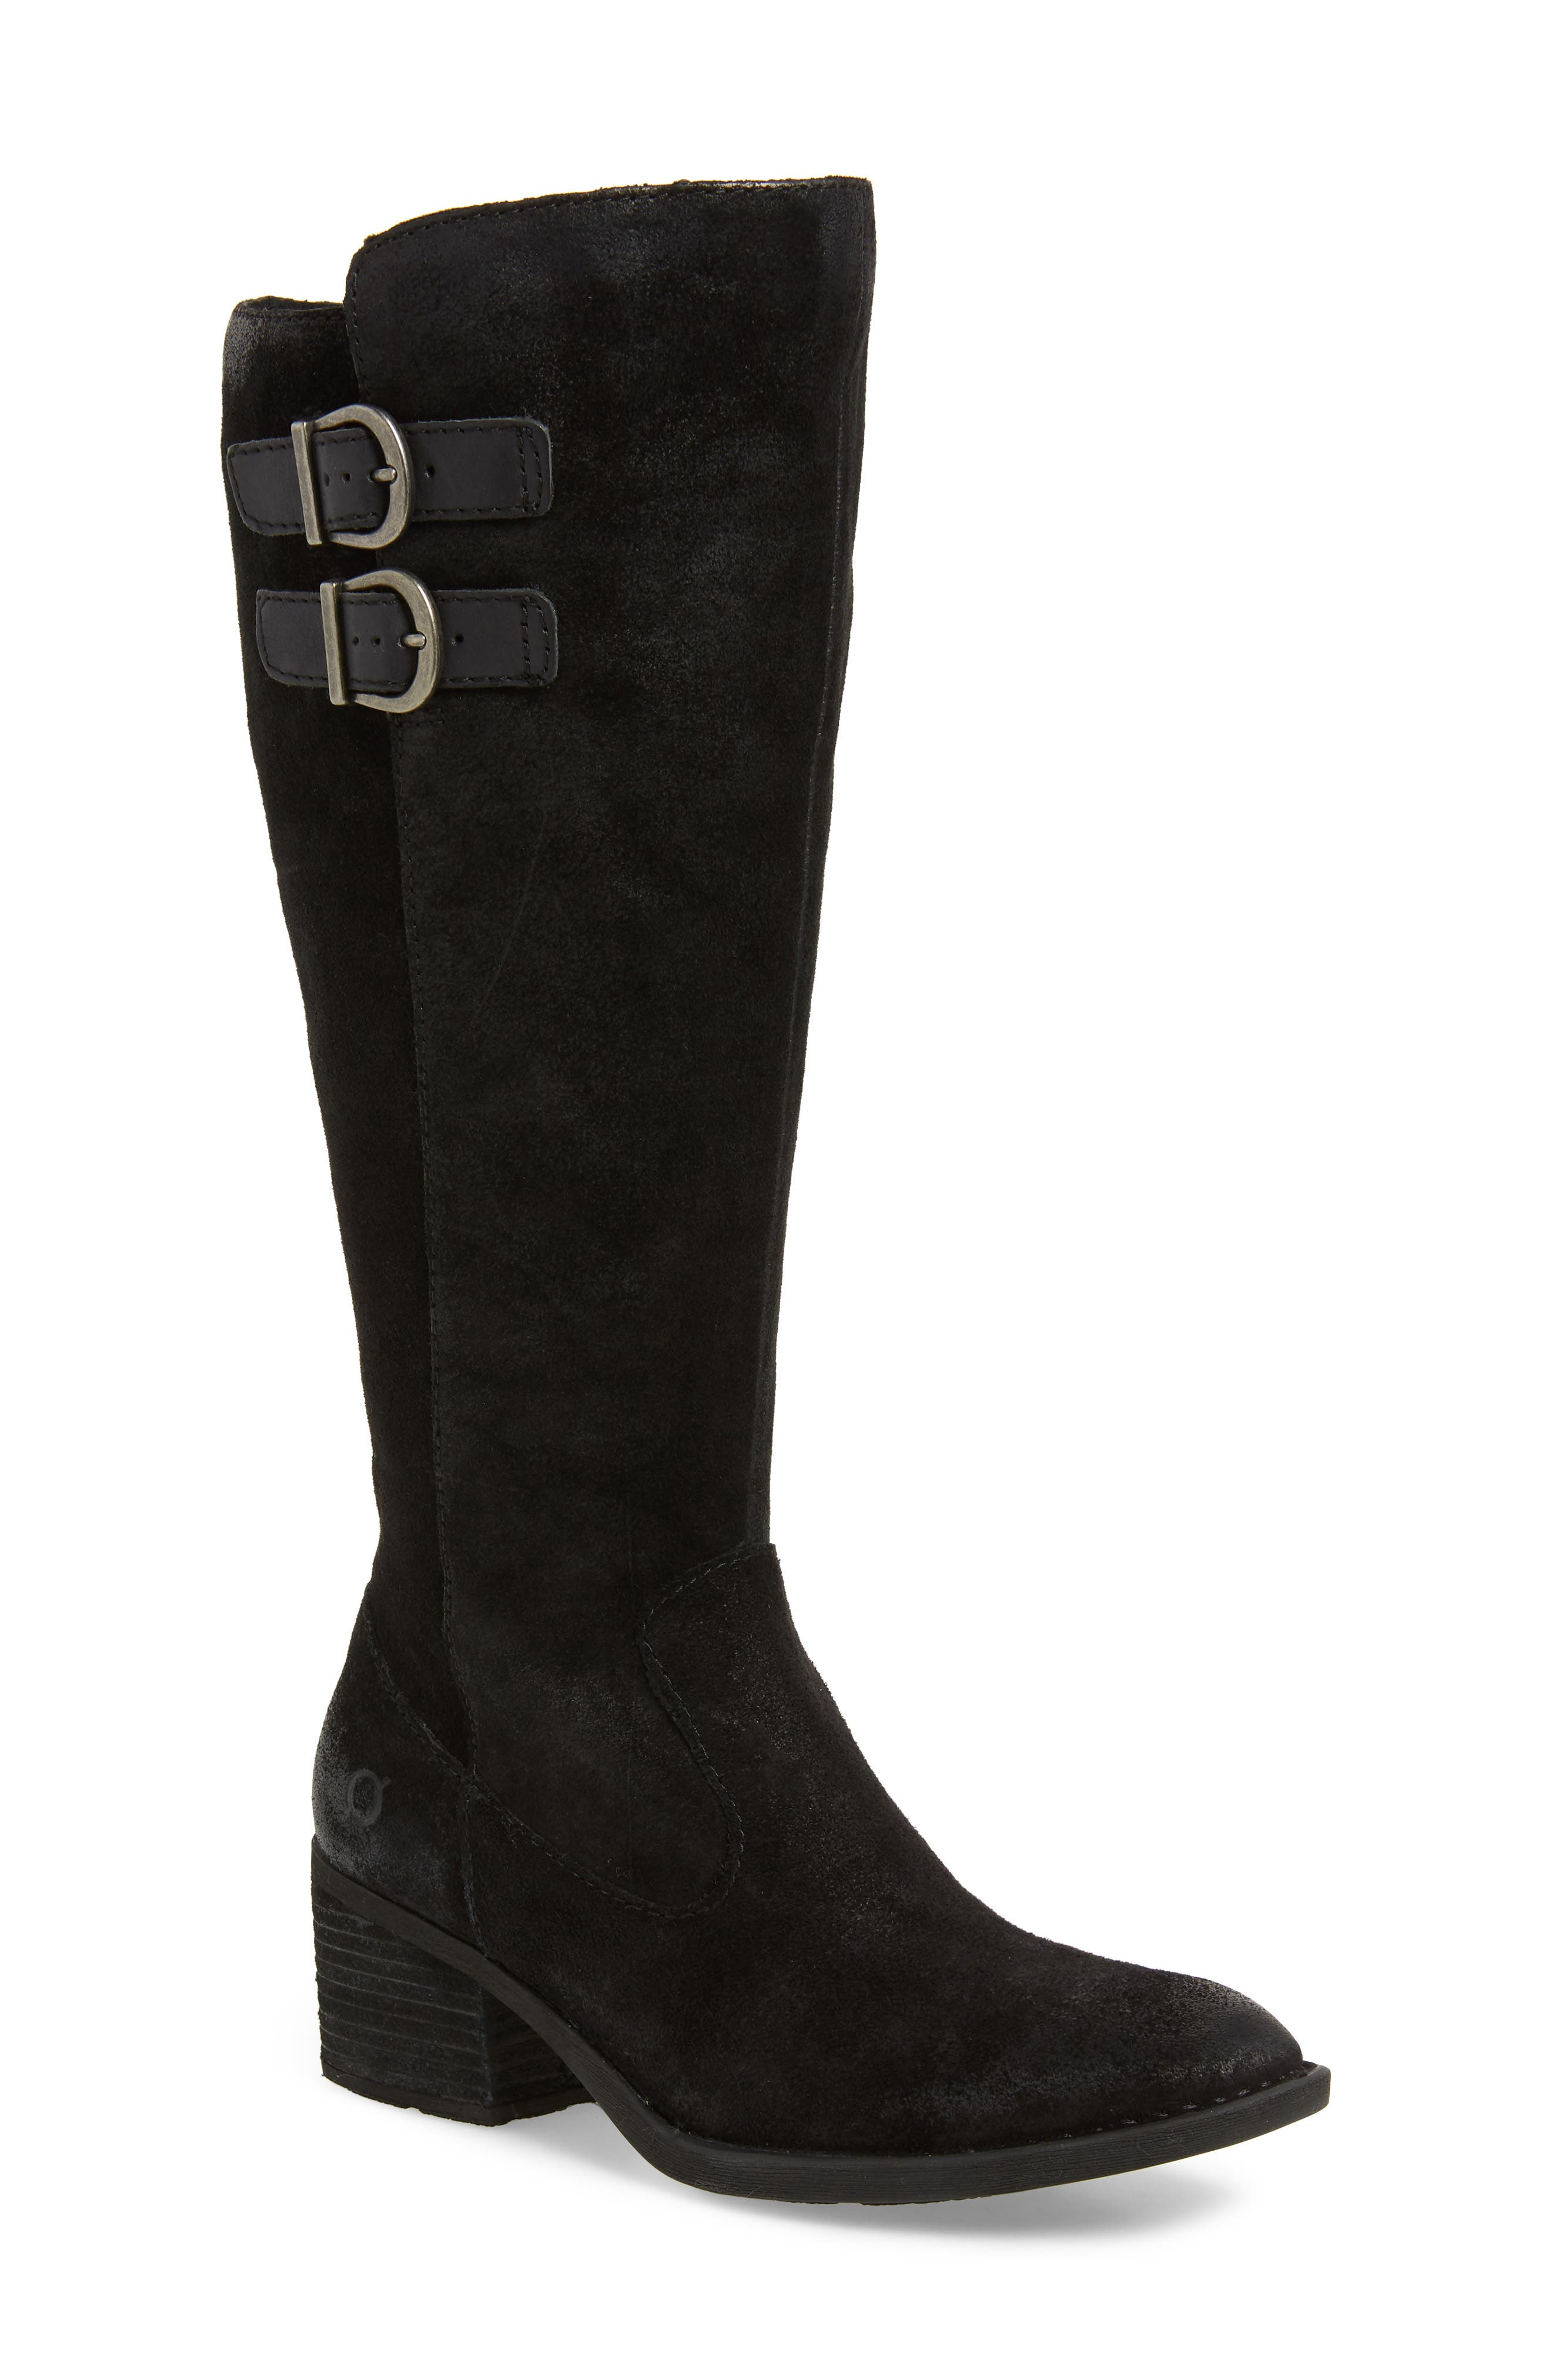 2966cc2183bb B rn Basil Knee High Boot Wide Calf- Black